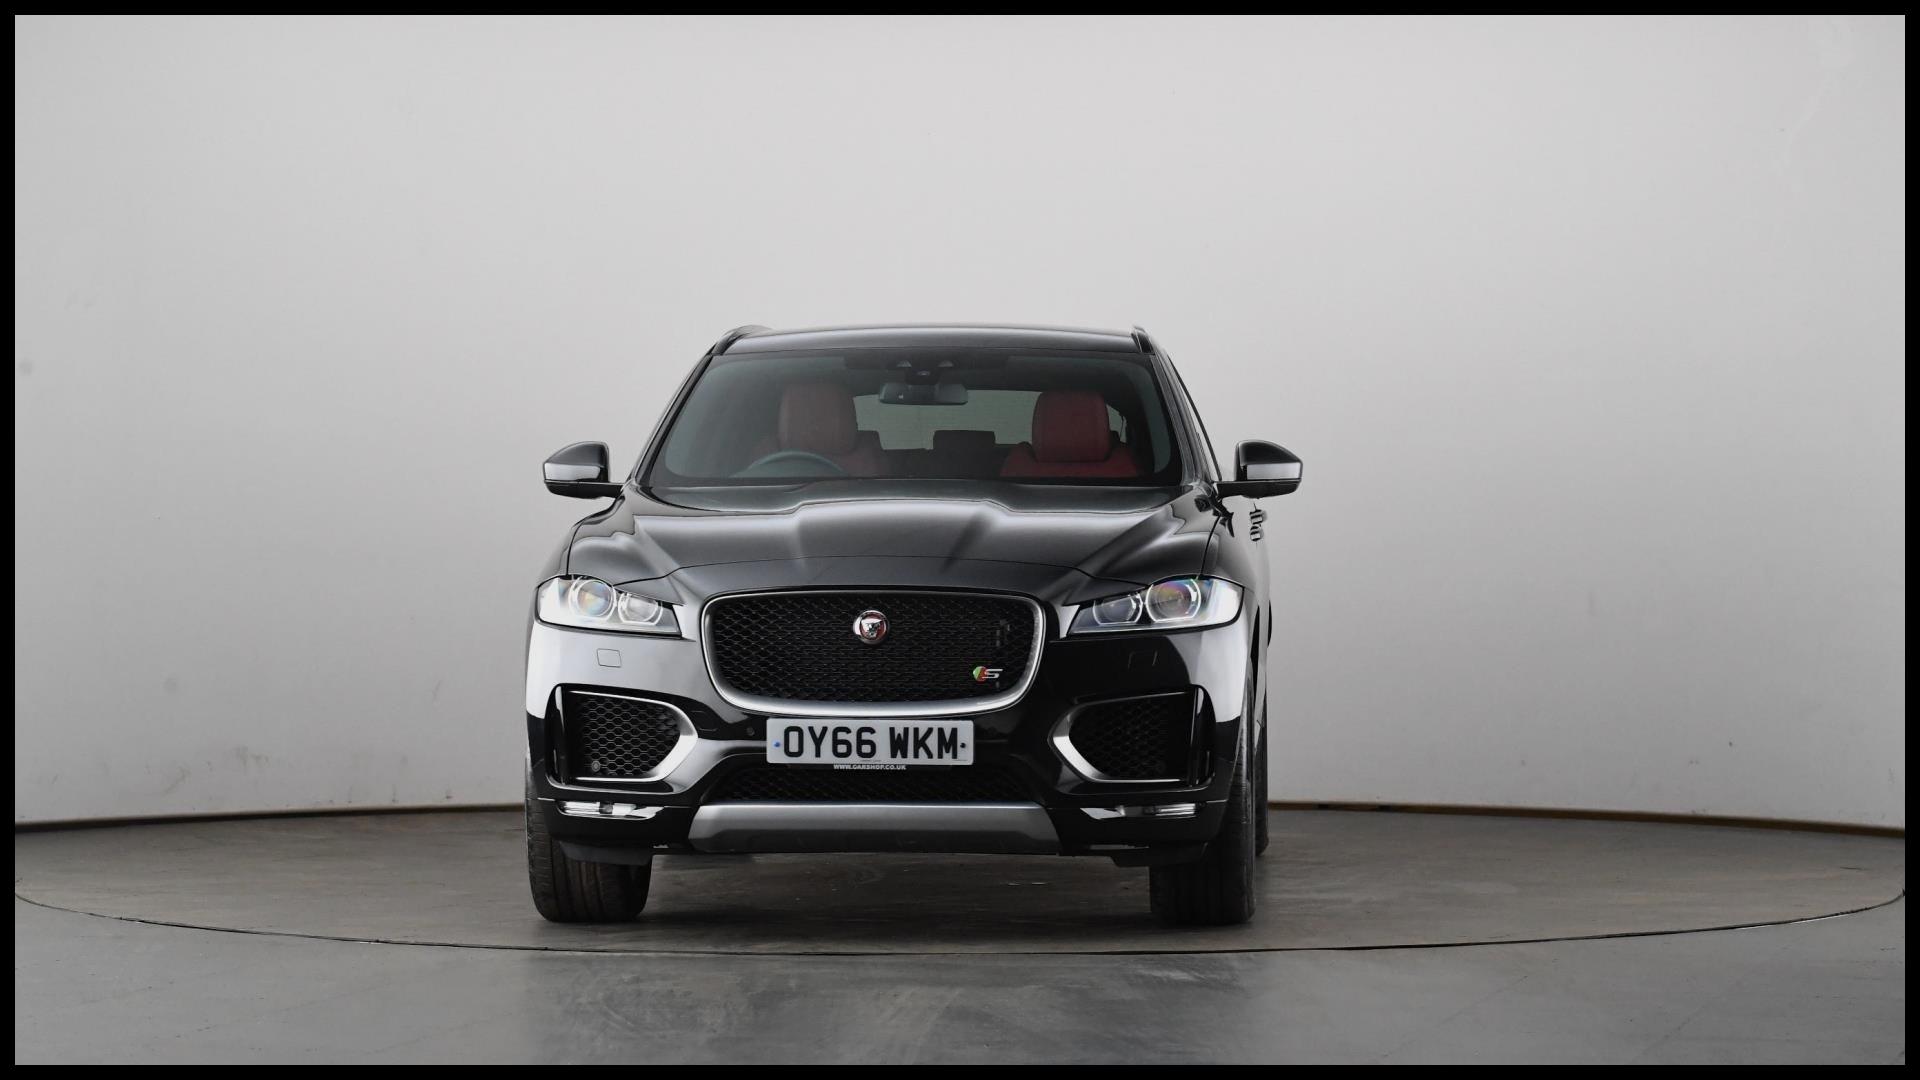 New Models Car 2016 New Special Bmw New Car Innovative Black Cars S Bmw X3 Xdrive